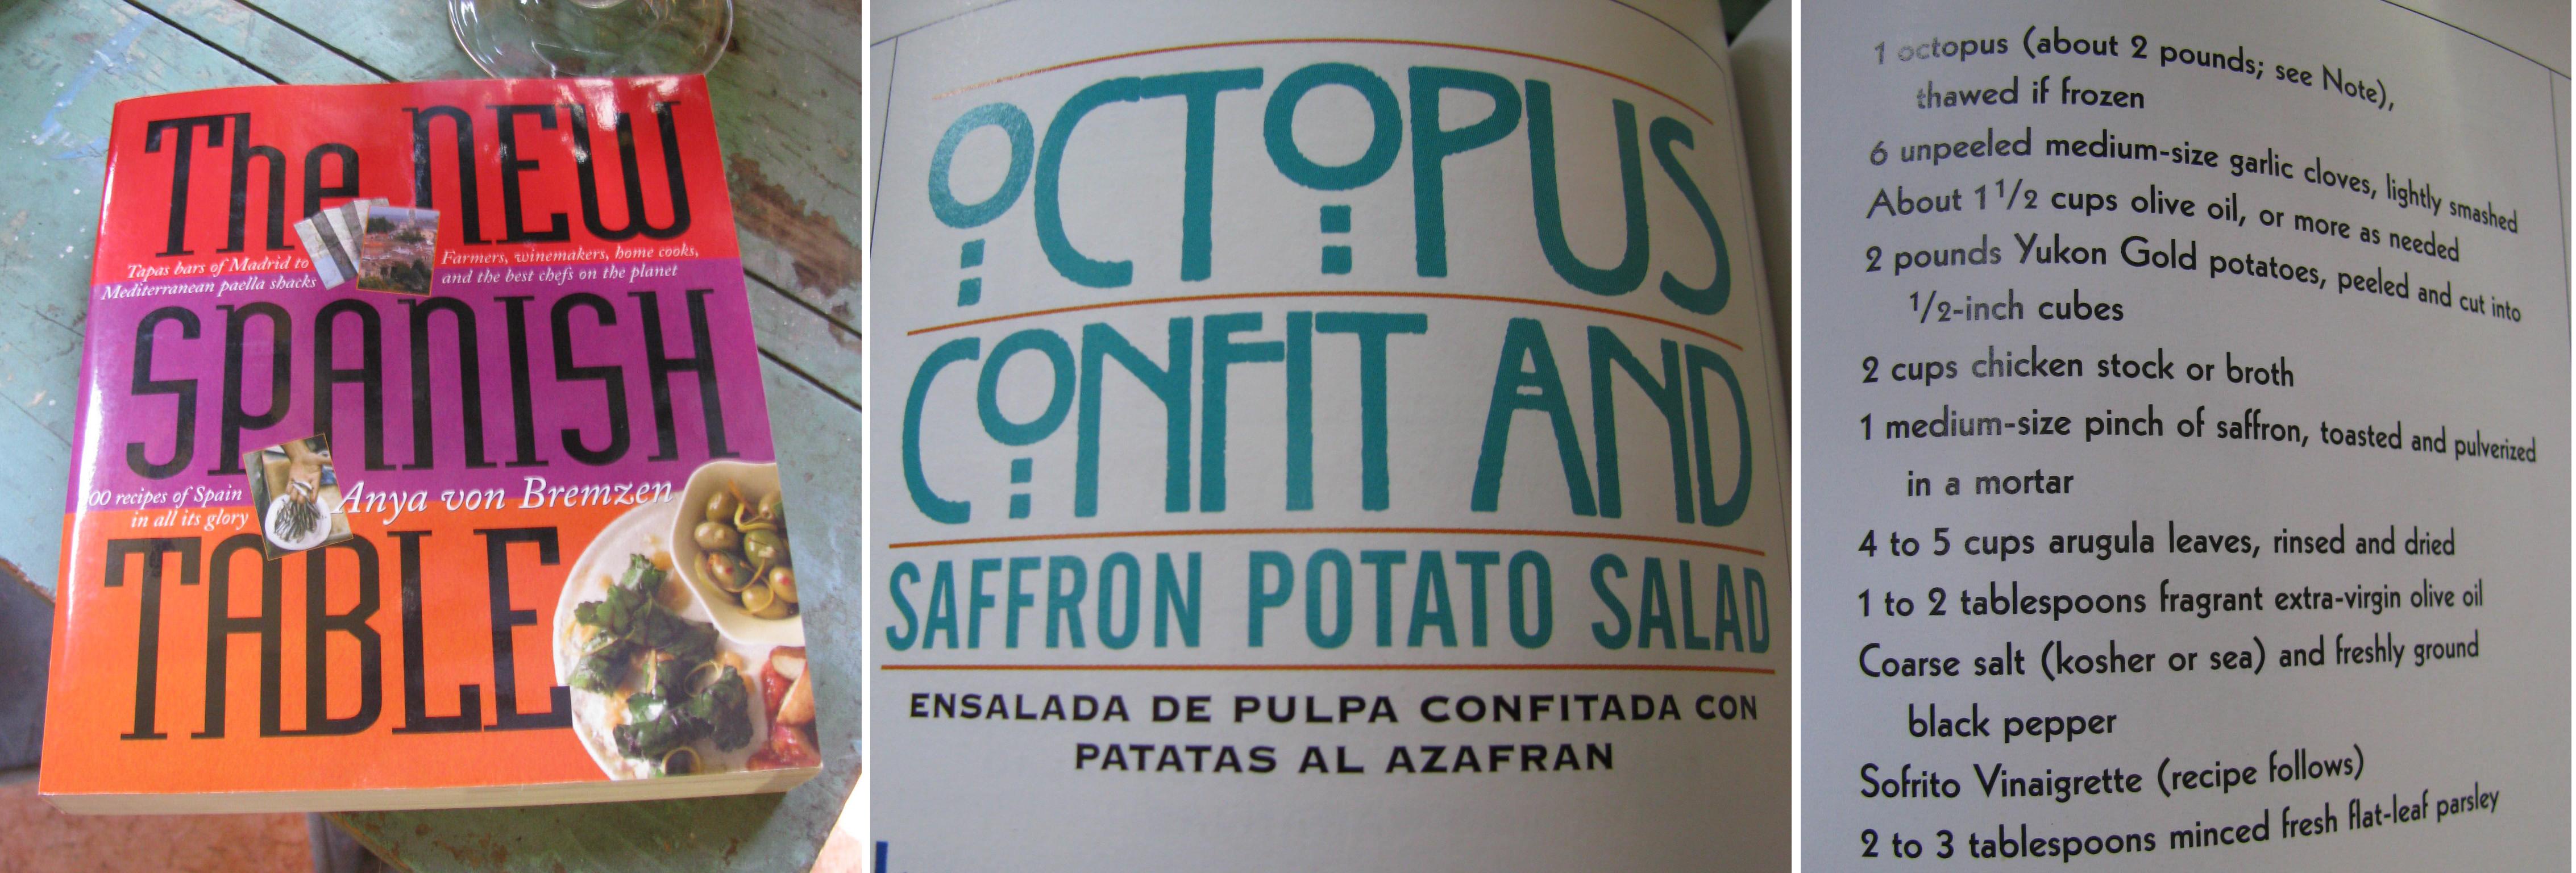 octopus_confit